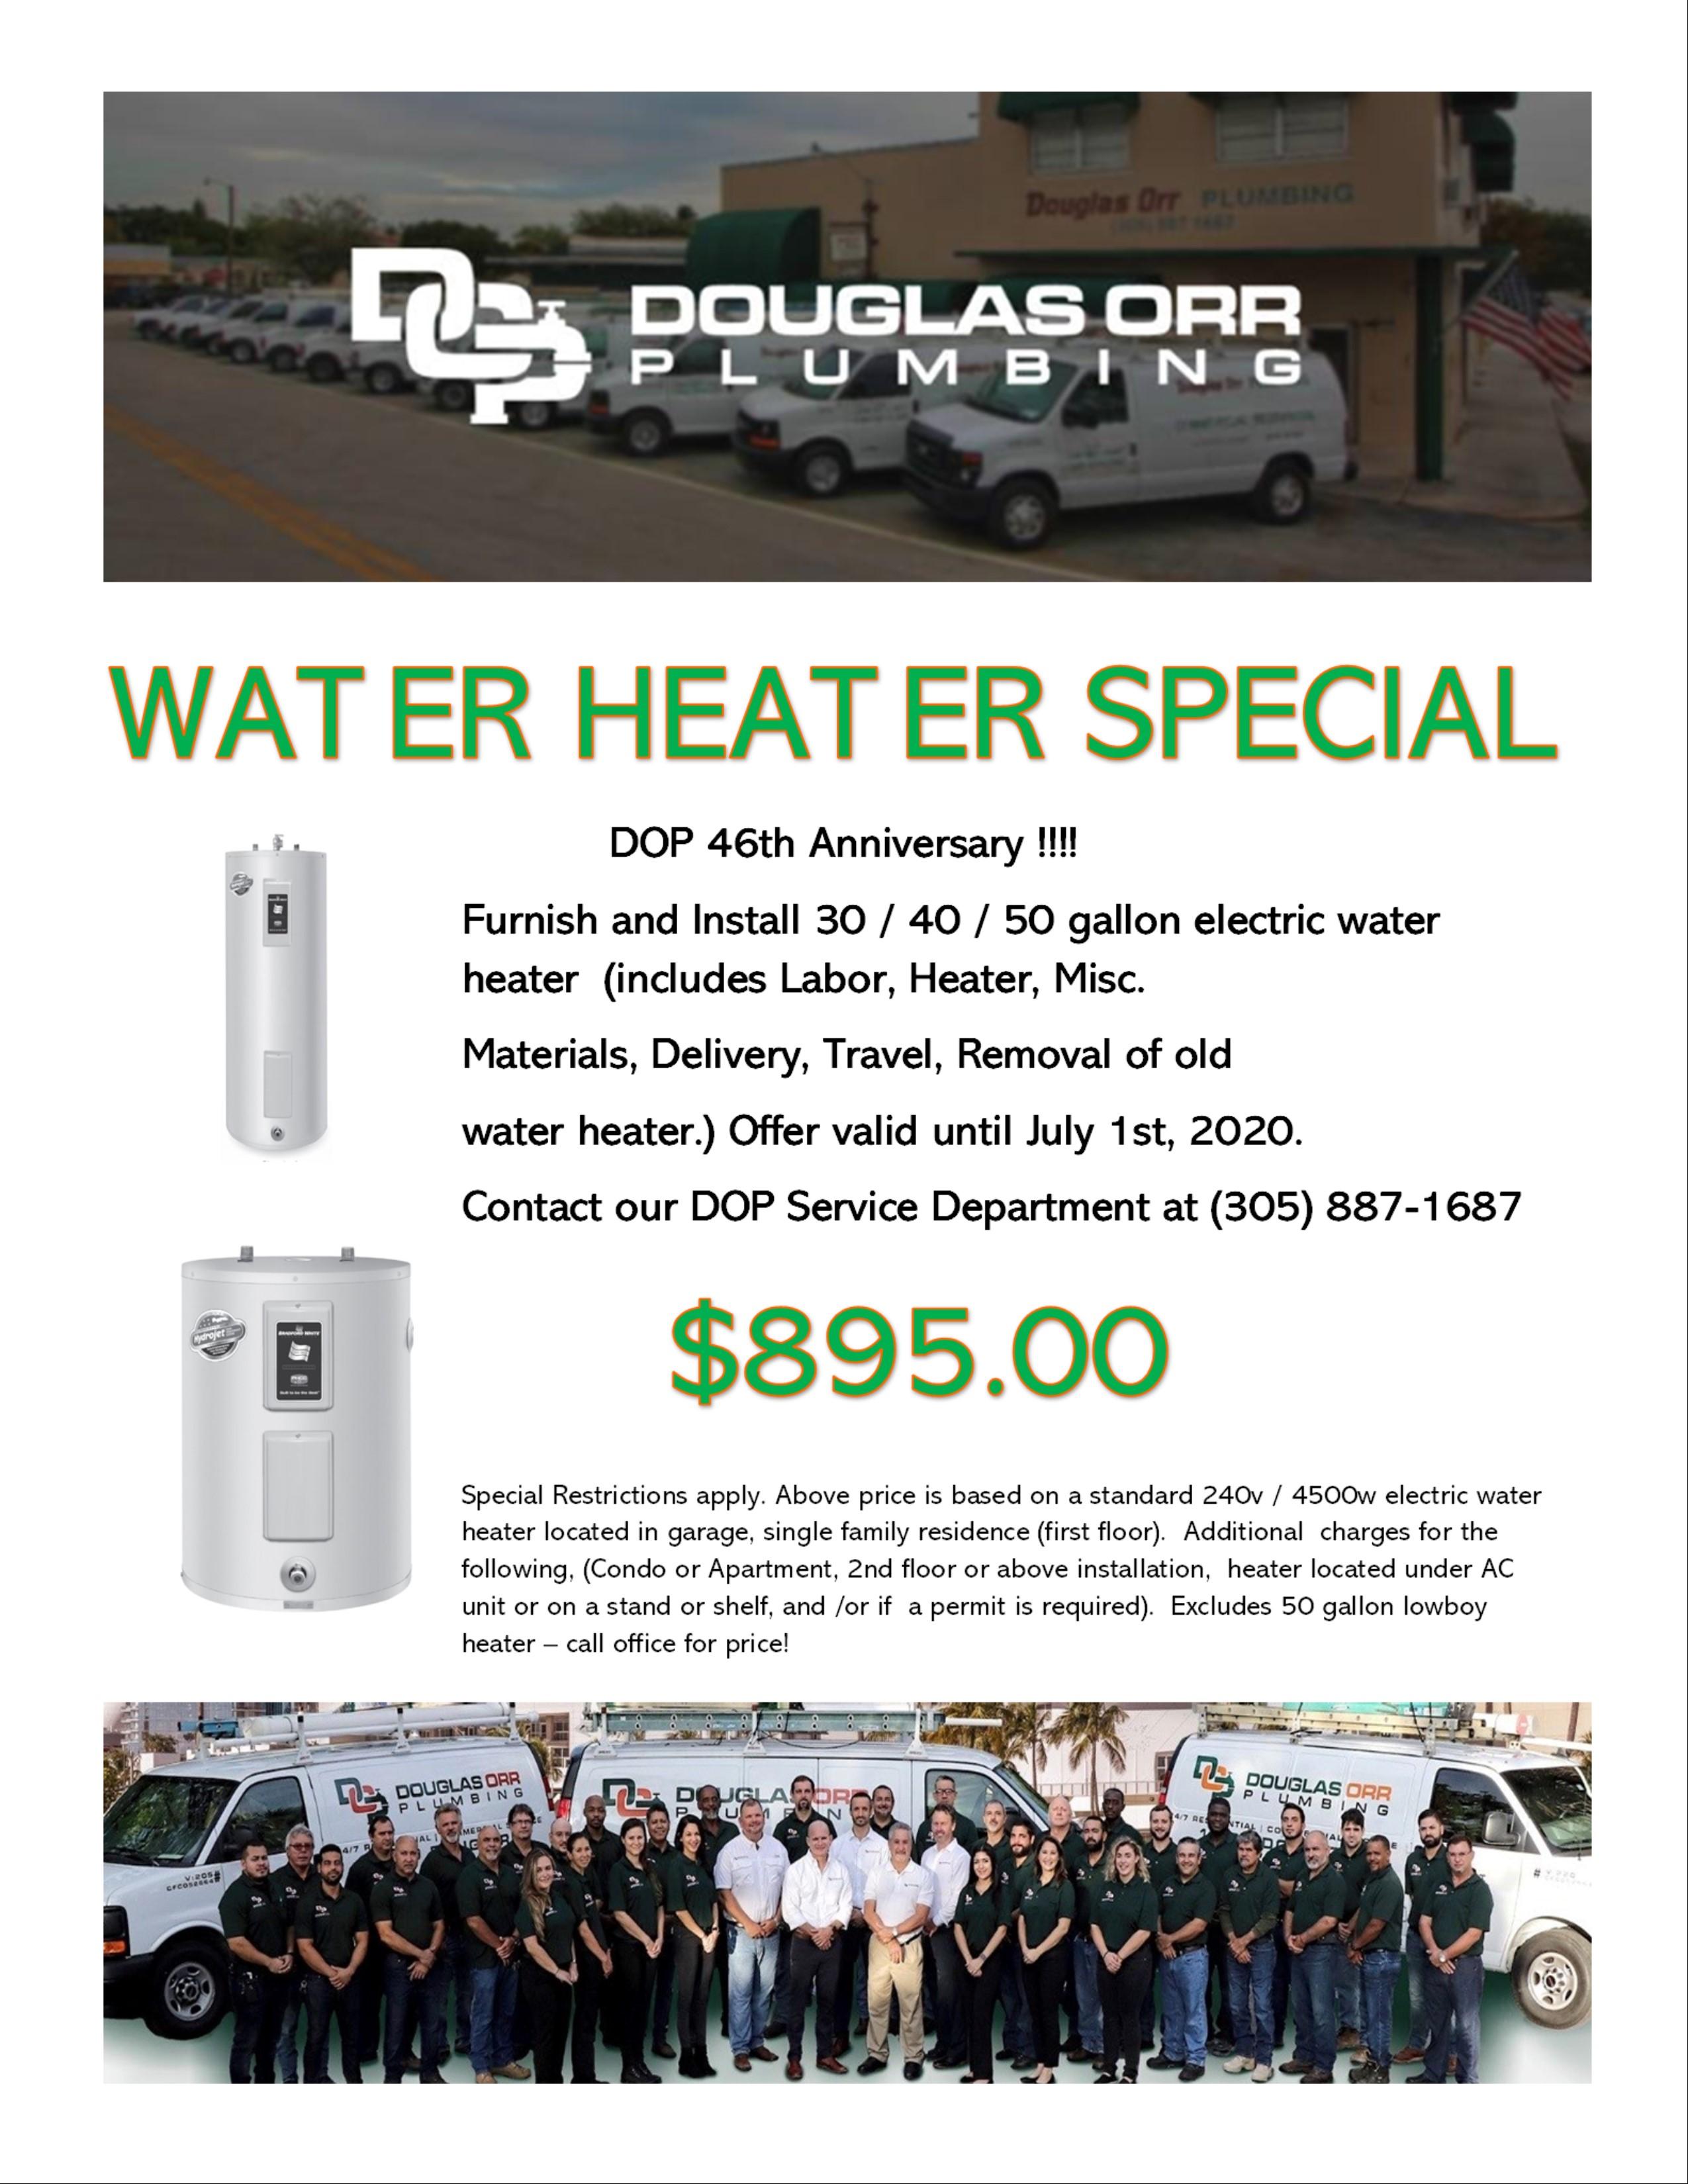 Douglas Orr Plumbing 46th Anniversary Heater Special